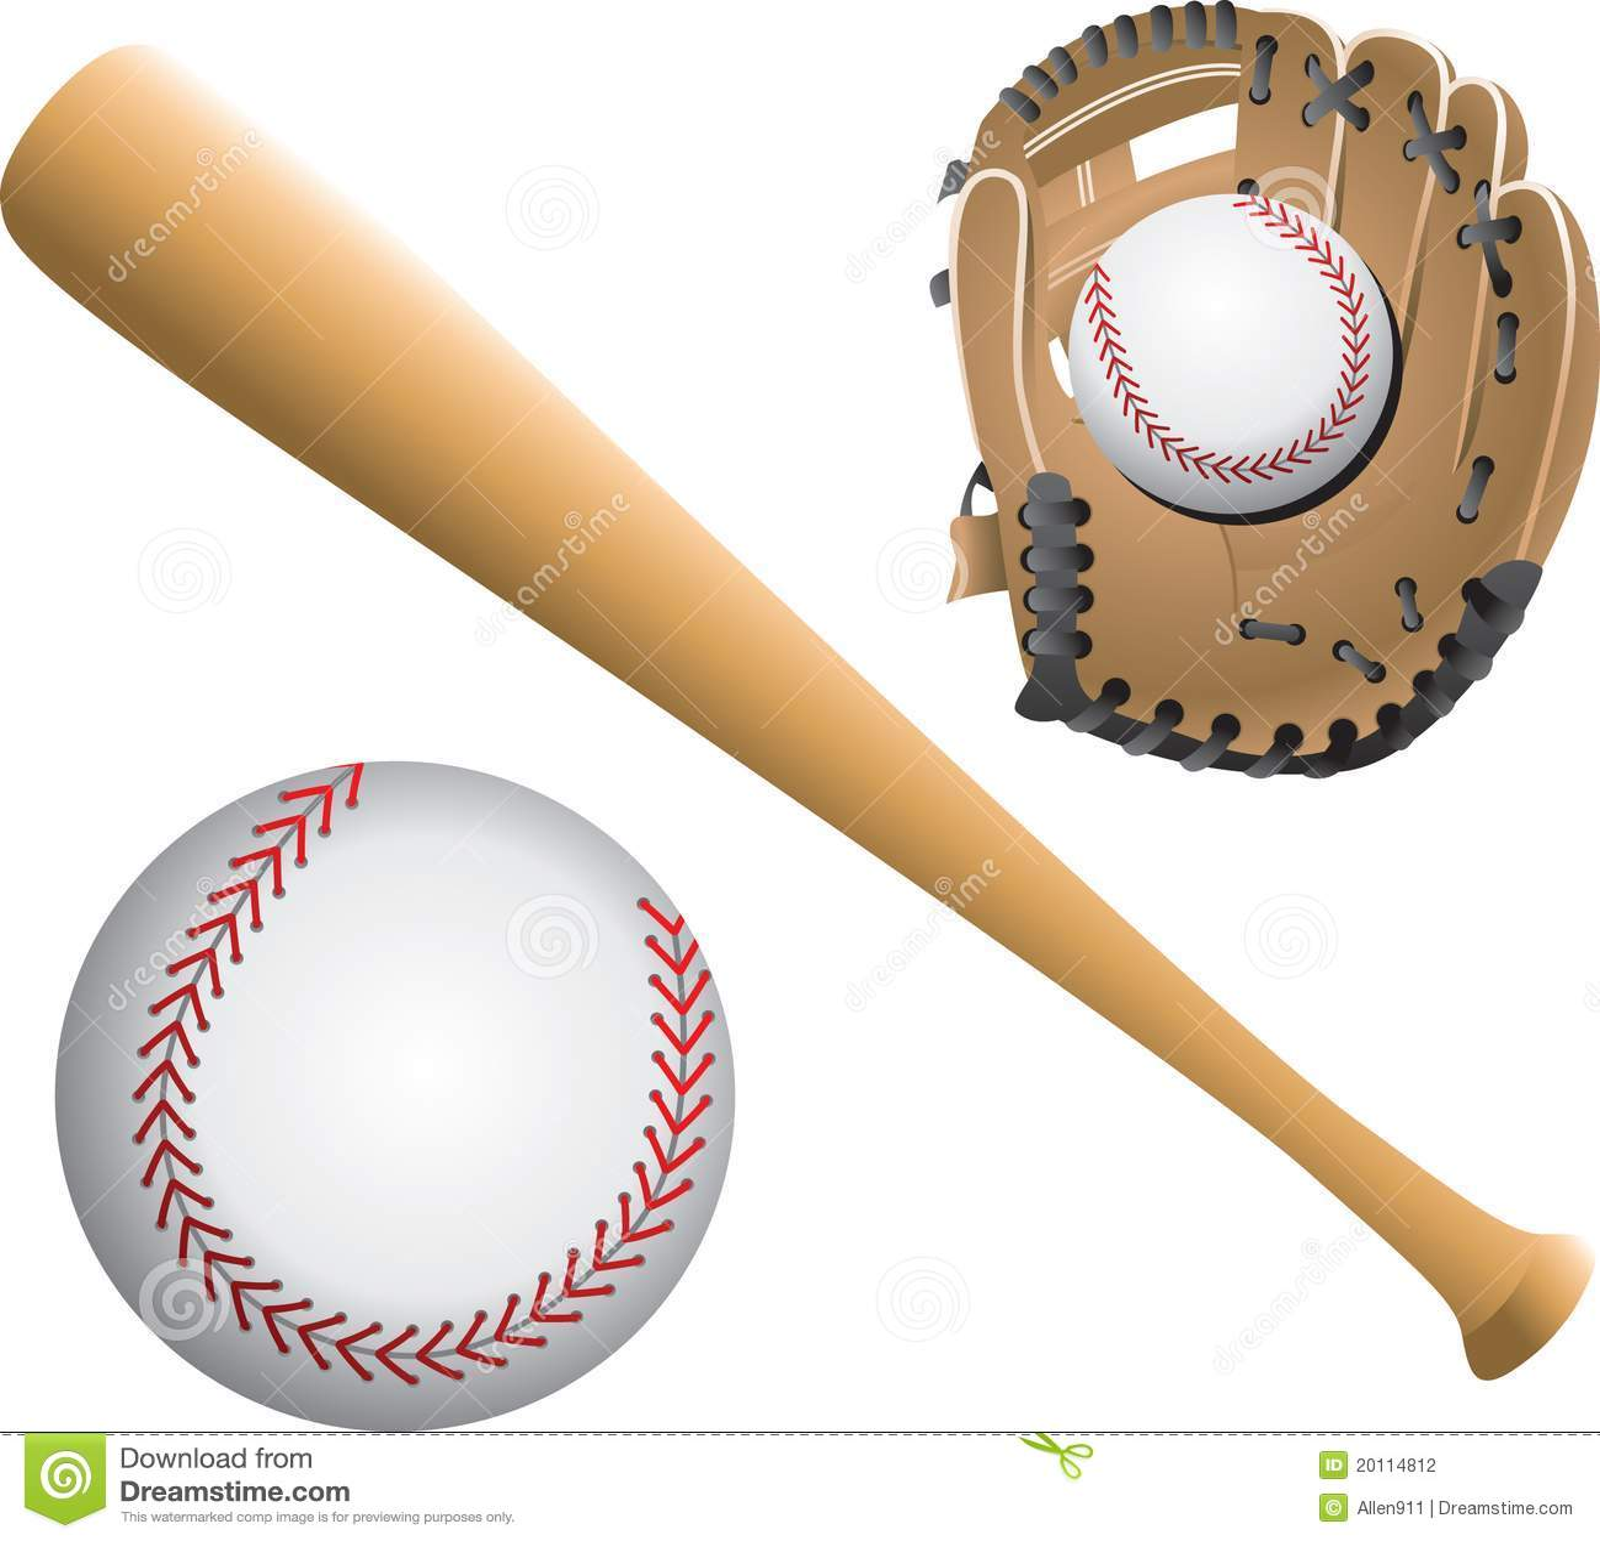 baseball diamonds  balls  and bats stock photography Crossed Bats with Flames Clip Art Baseball Crossed Bats Clip Art Black and White